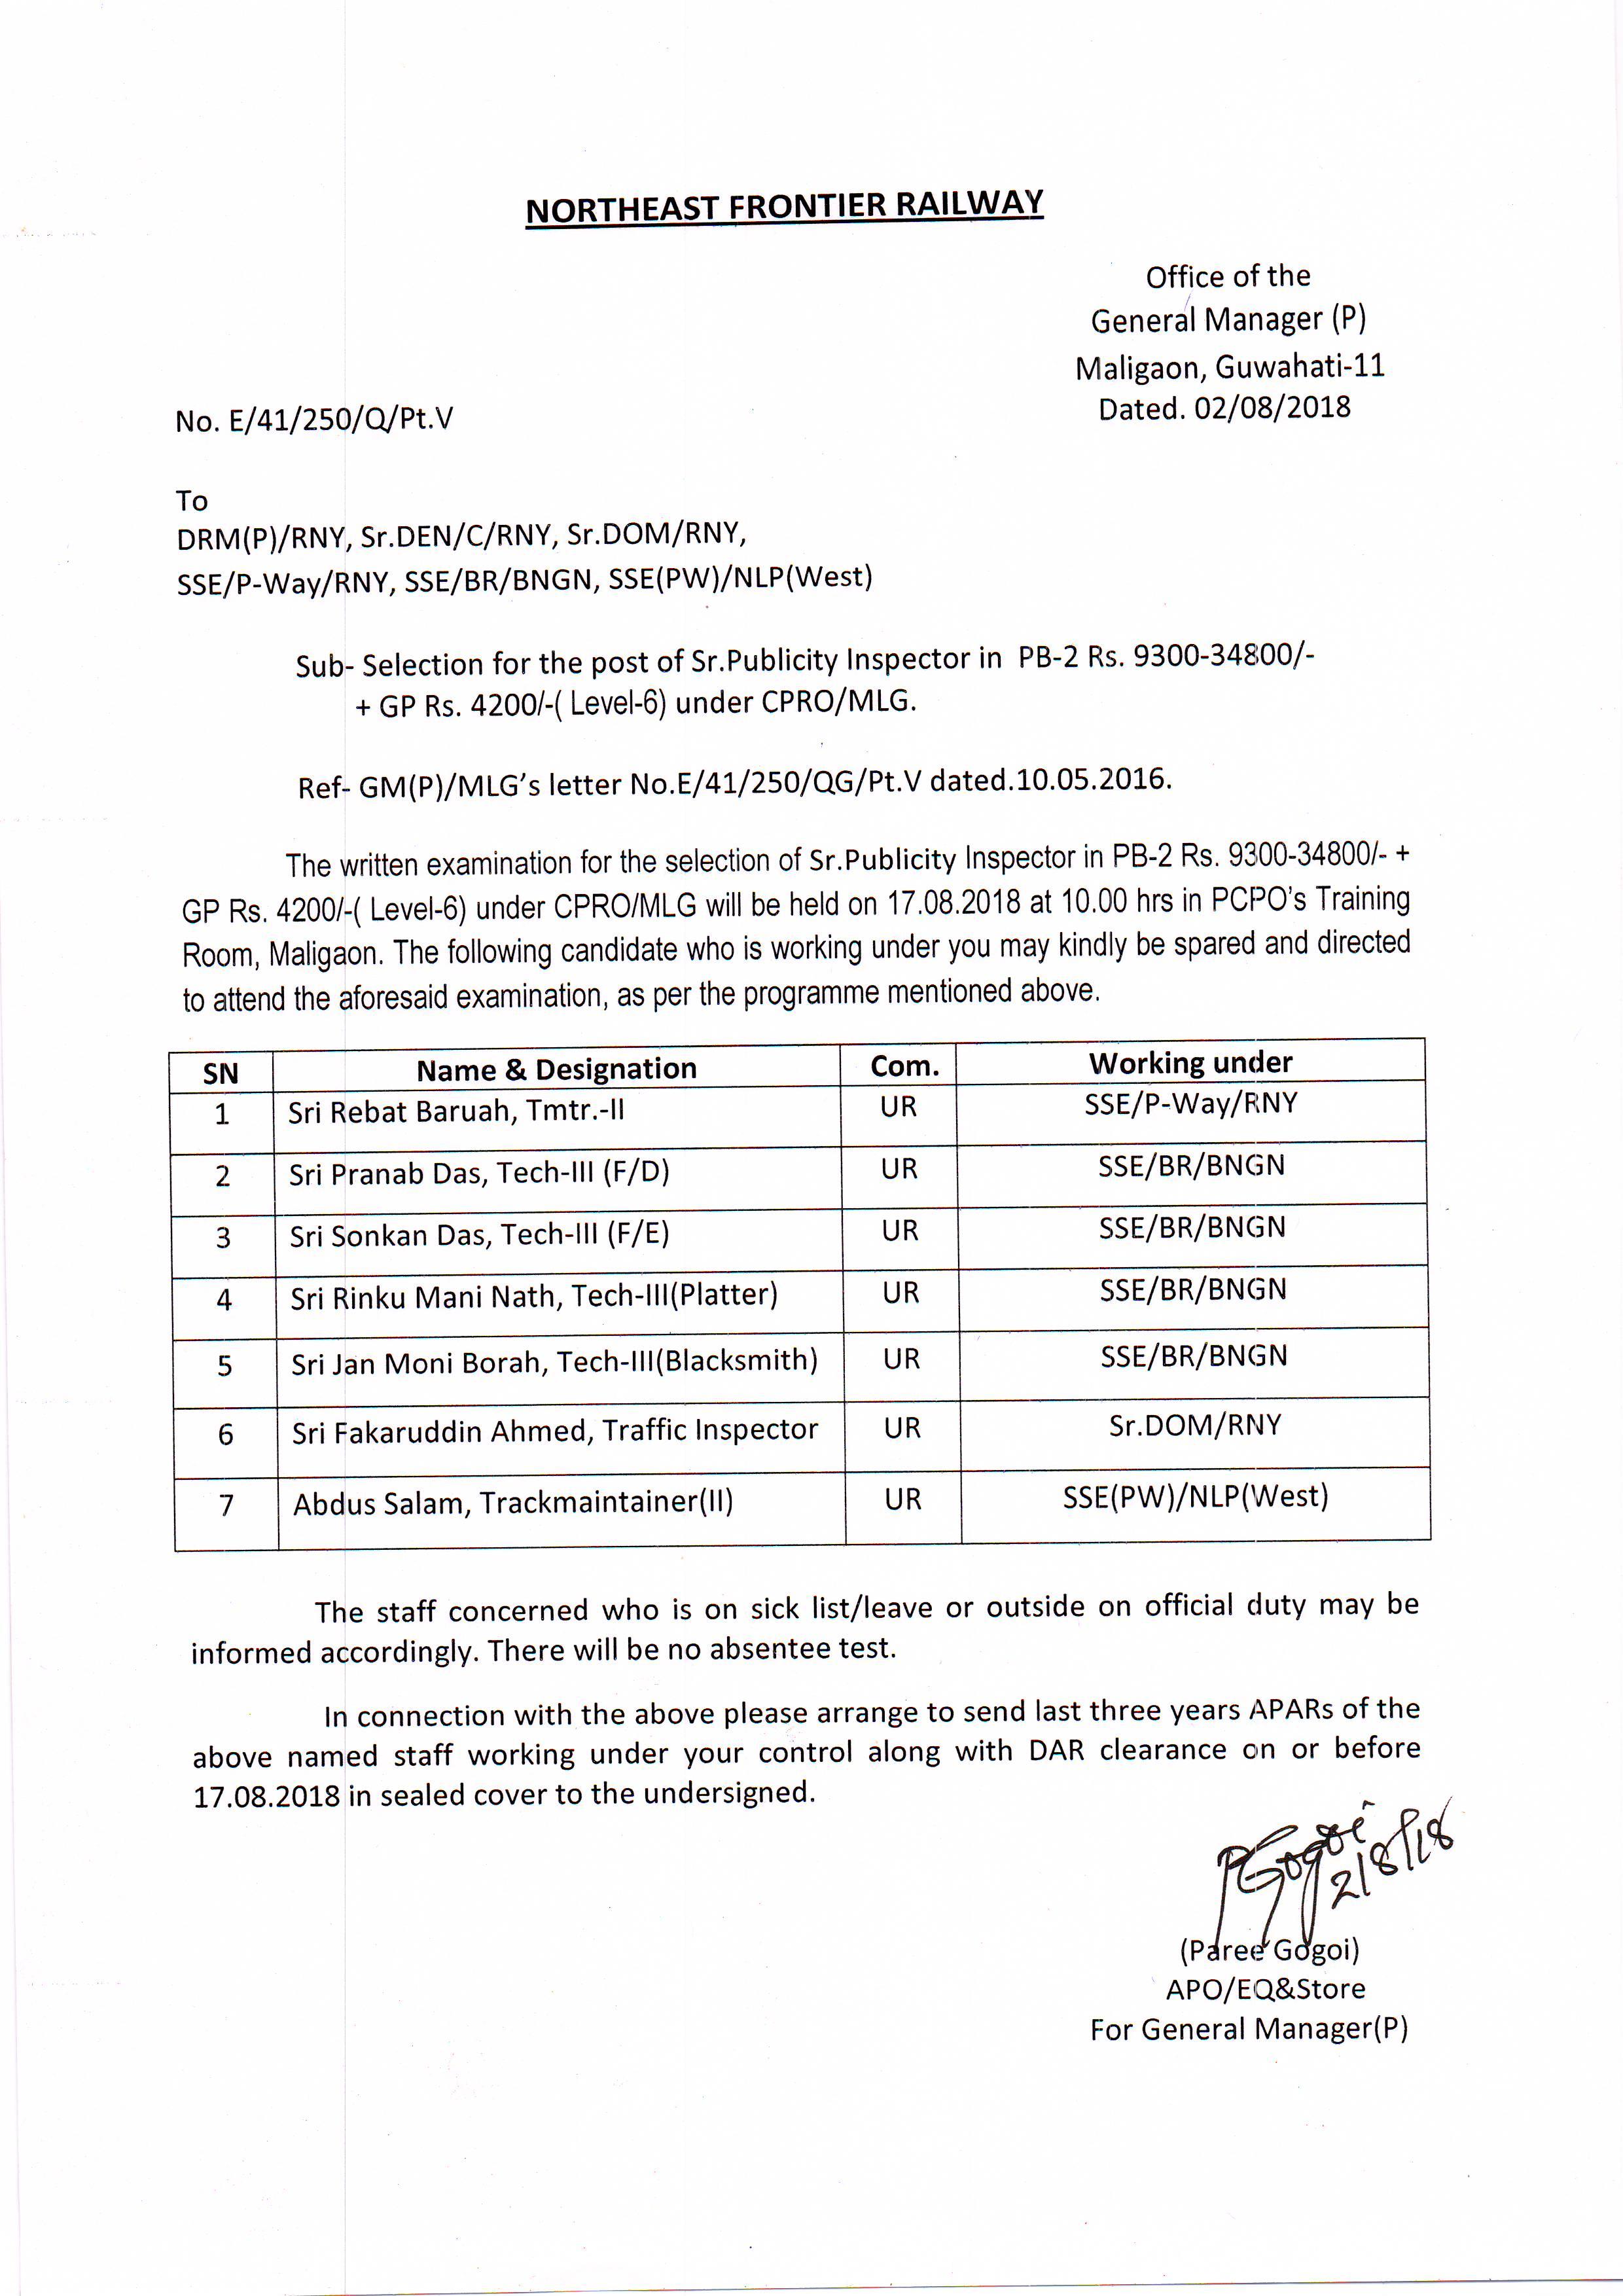 Nfr Calendar.Welcome To North East Frontier Railway Indian Railways Portal